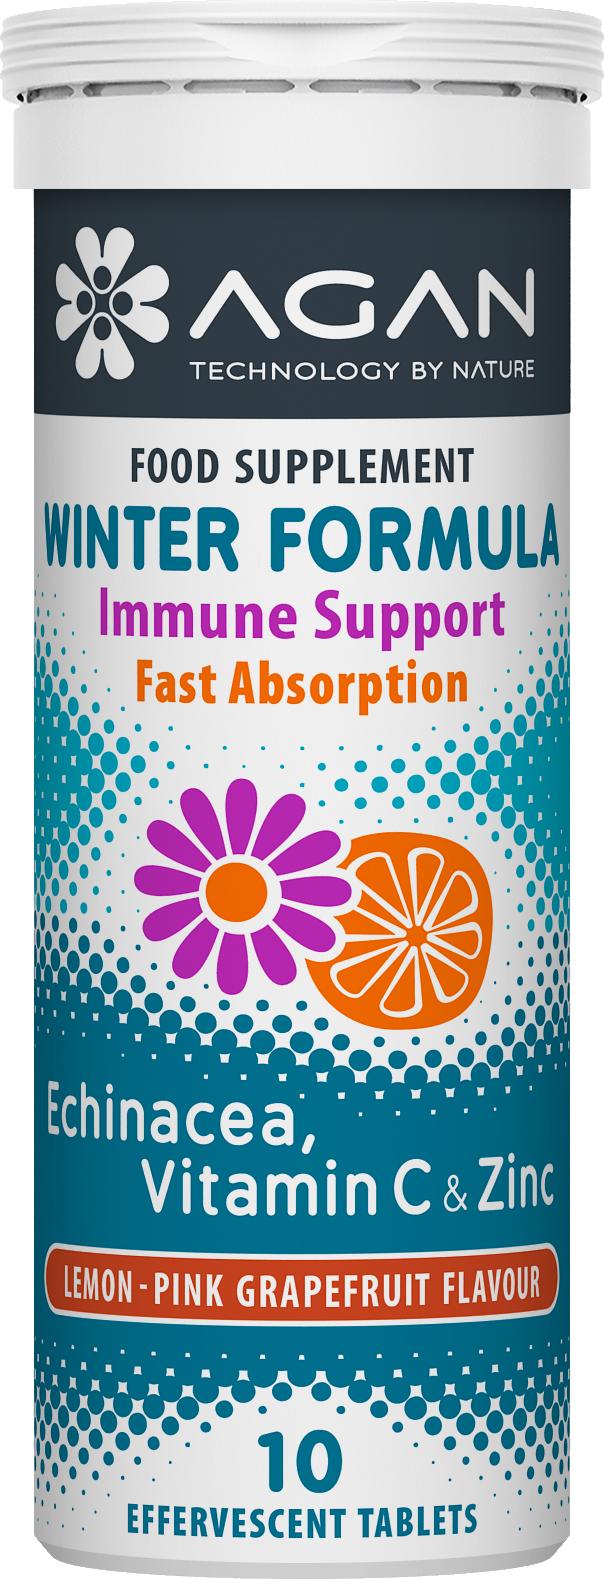 WINTER FORMULA IMMUNE SUPPORT